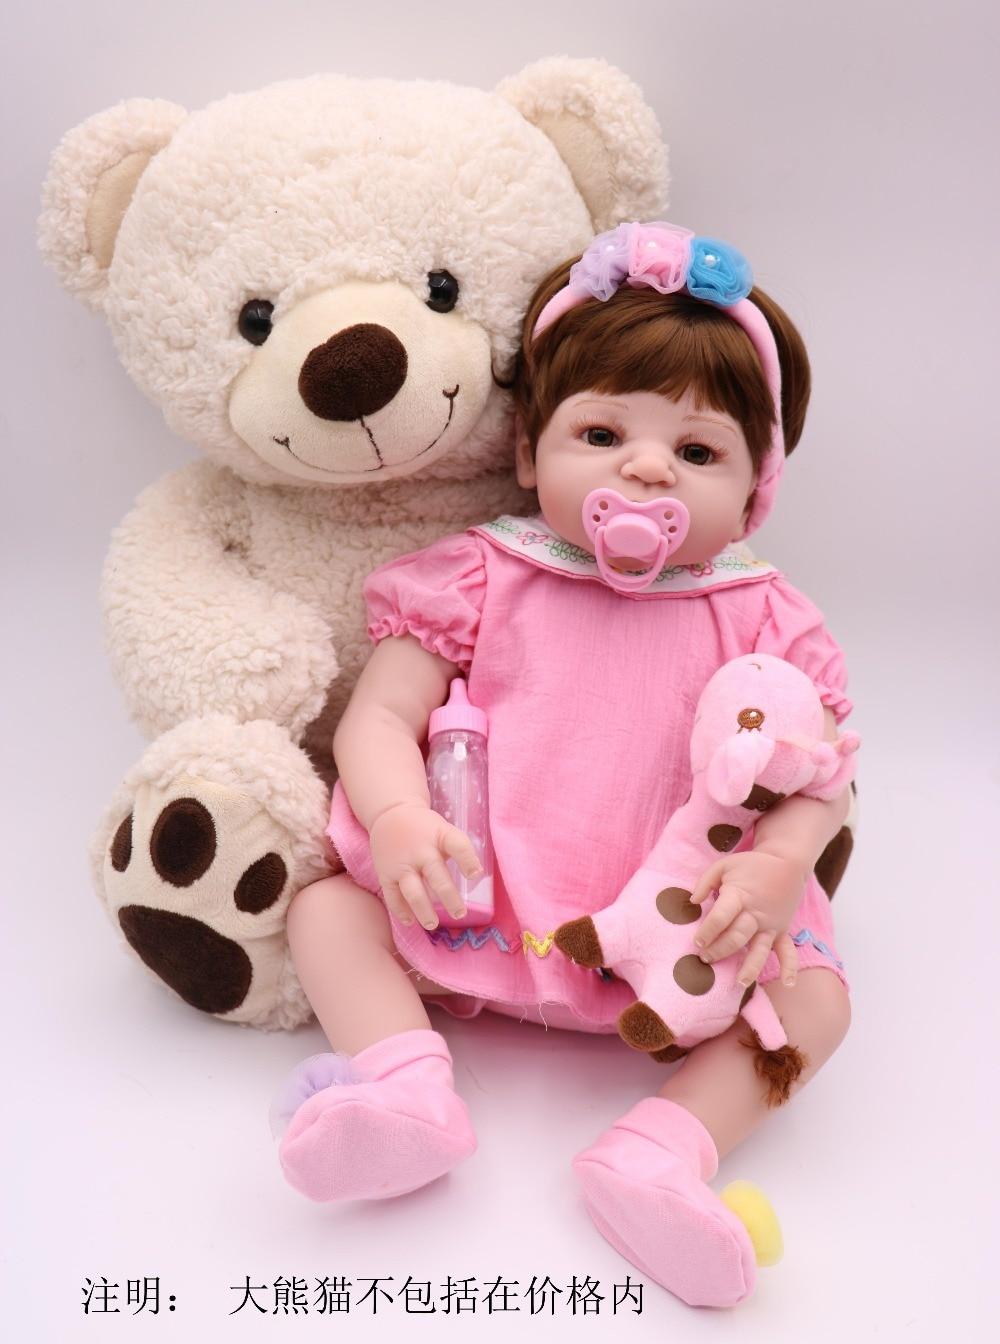 все цены на Dollhouse 55cm New arrival full Silicone adora Lifelike newborn Baby girl best kids bathe toy silicone Bonecas Bebe Reborn doll онлайн